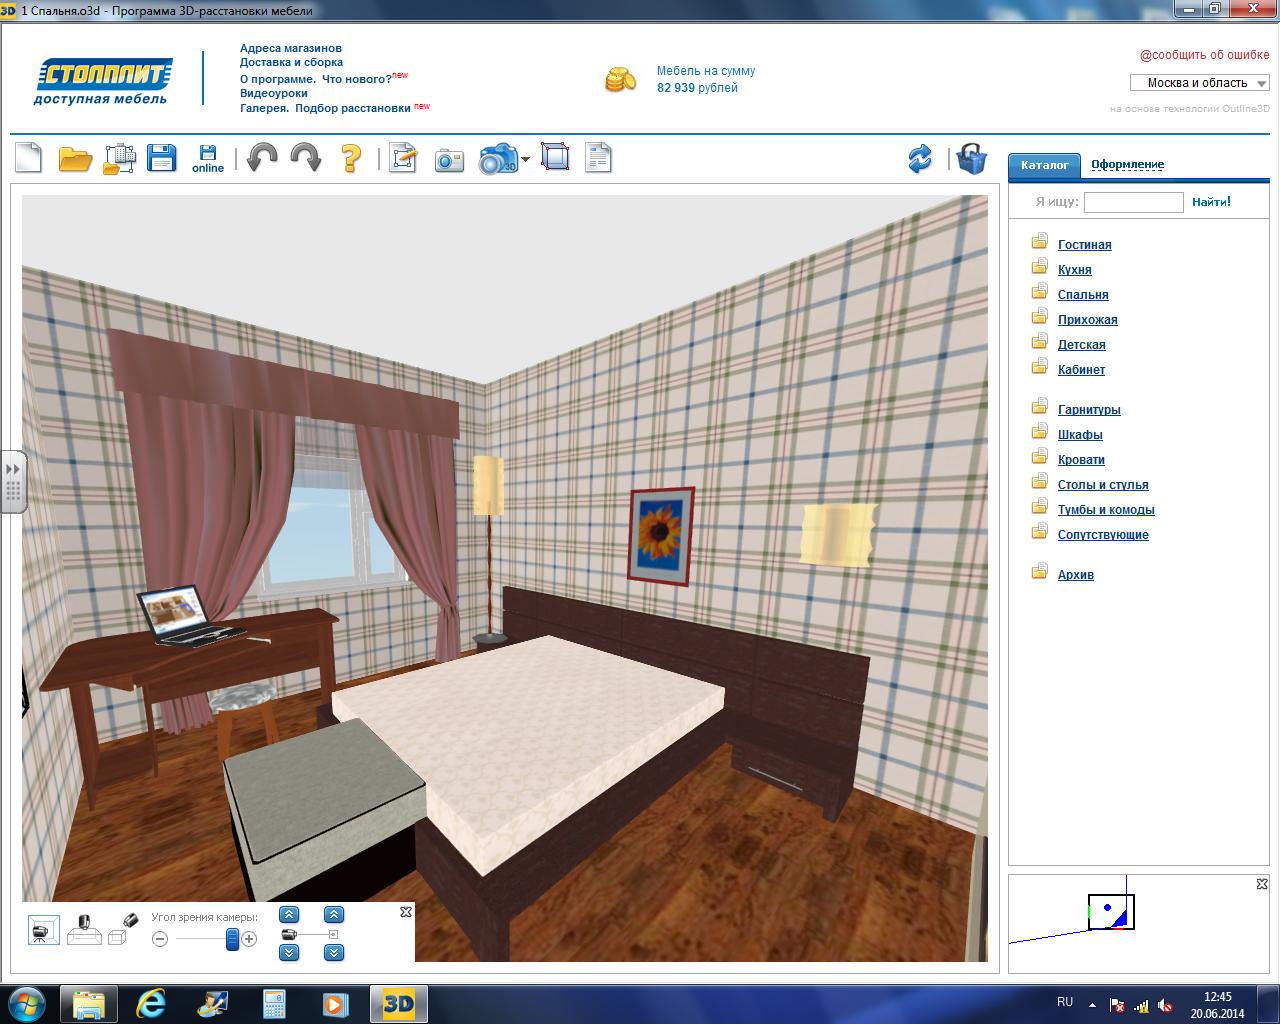 Программа для создание интерьера комнаты